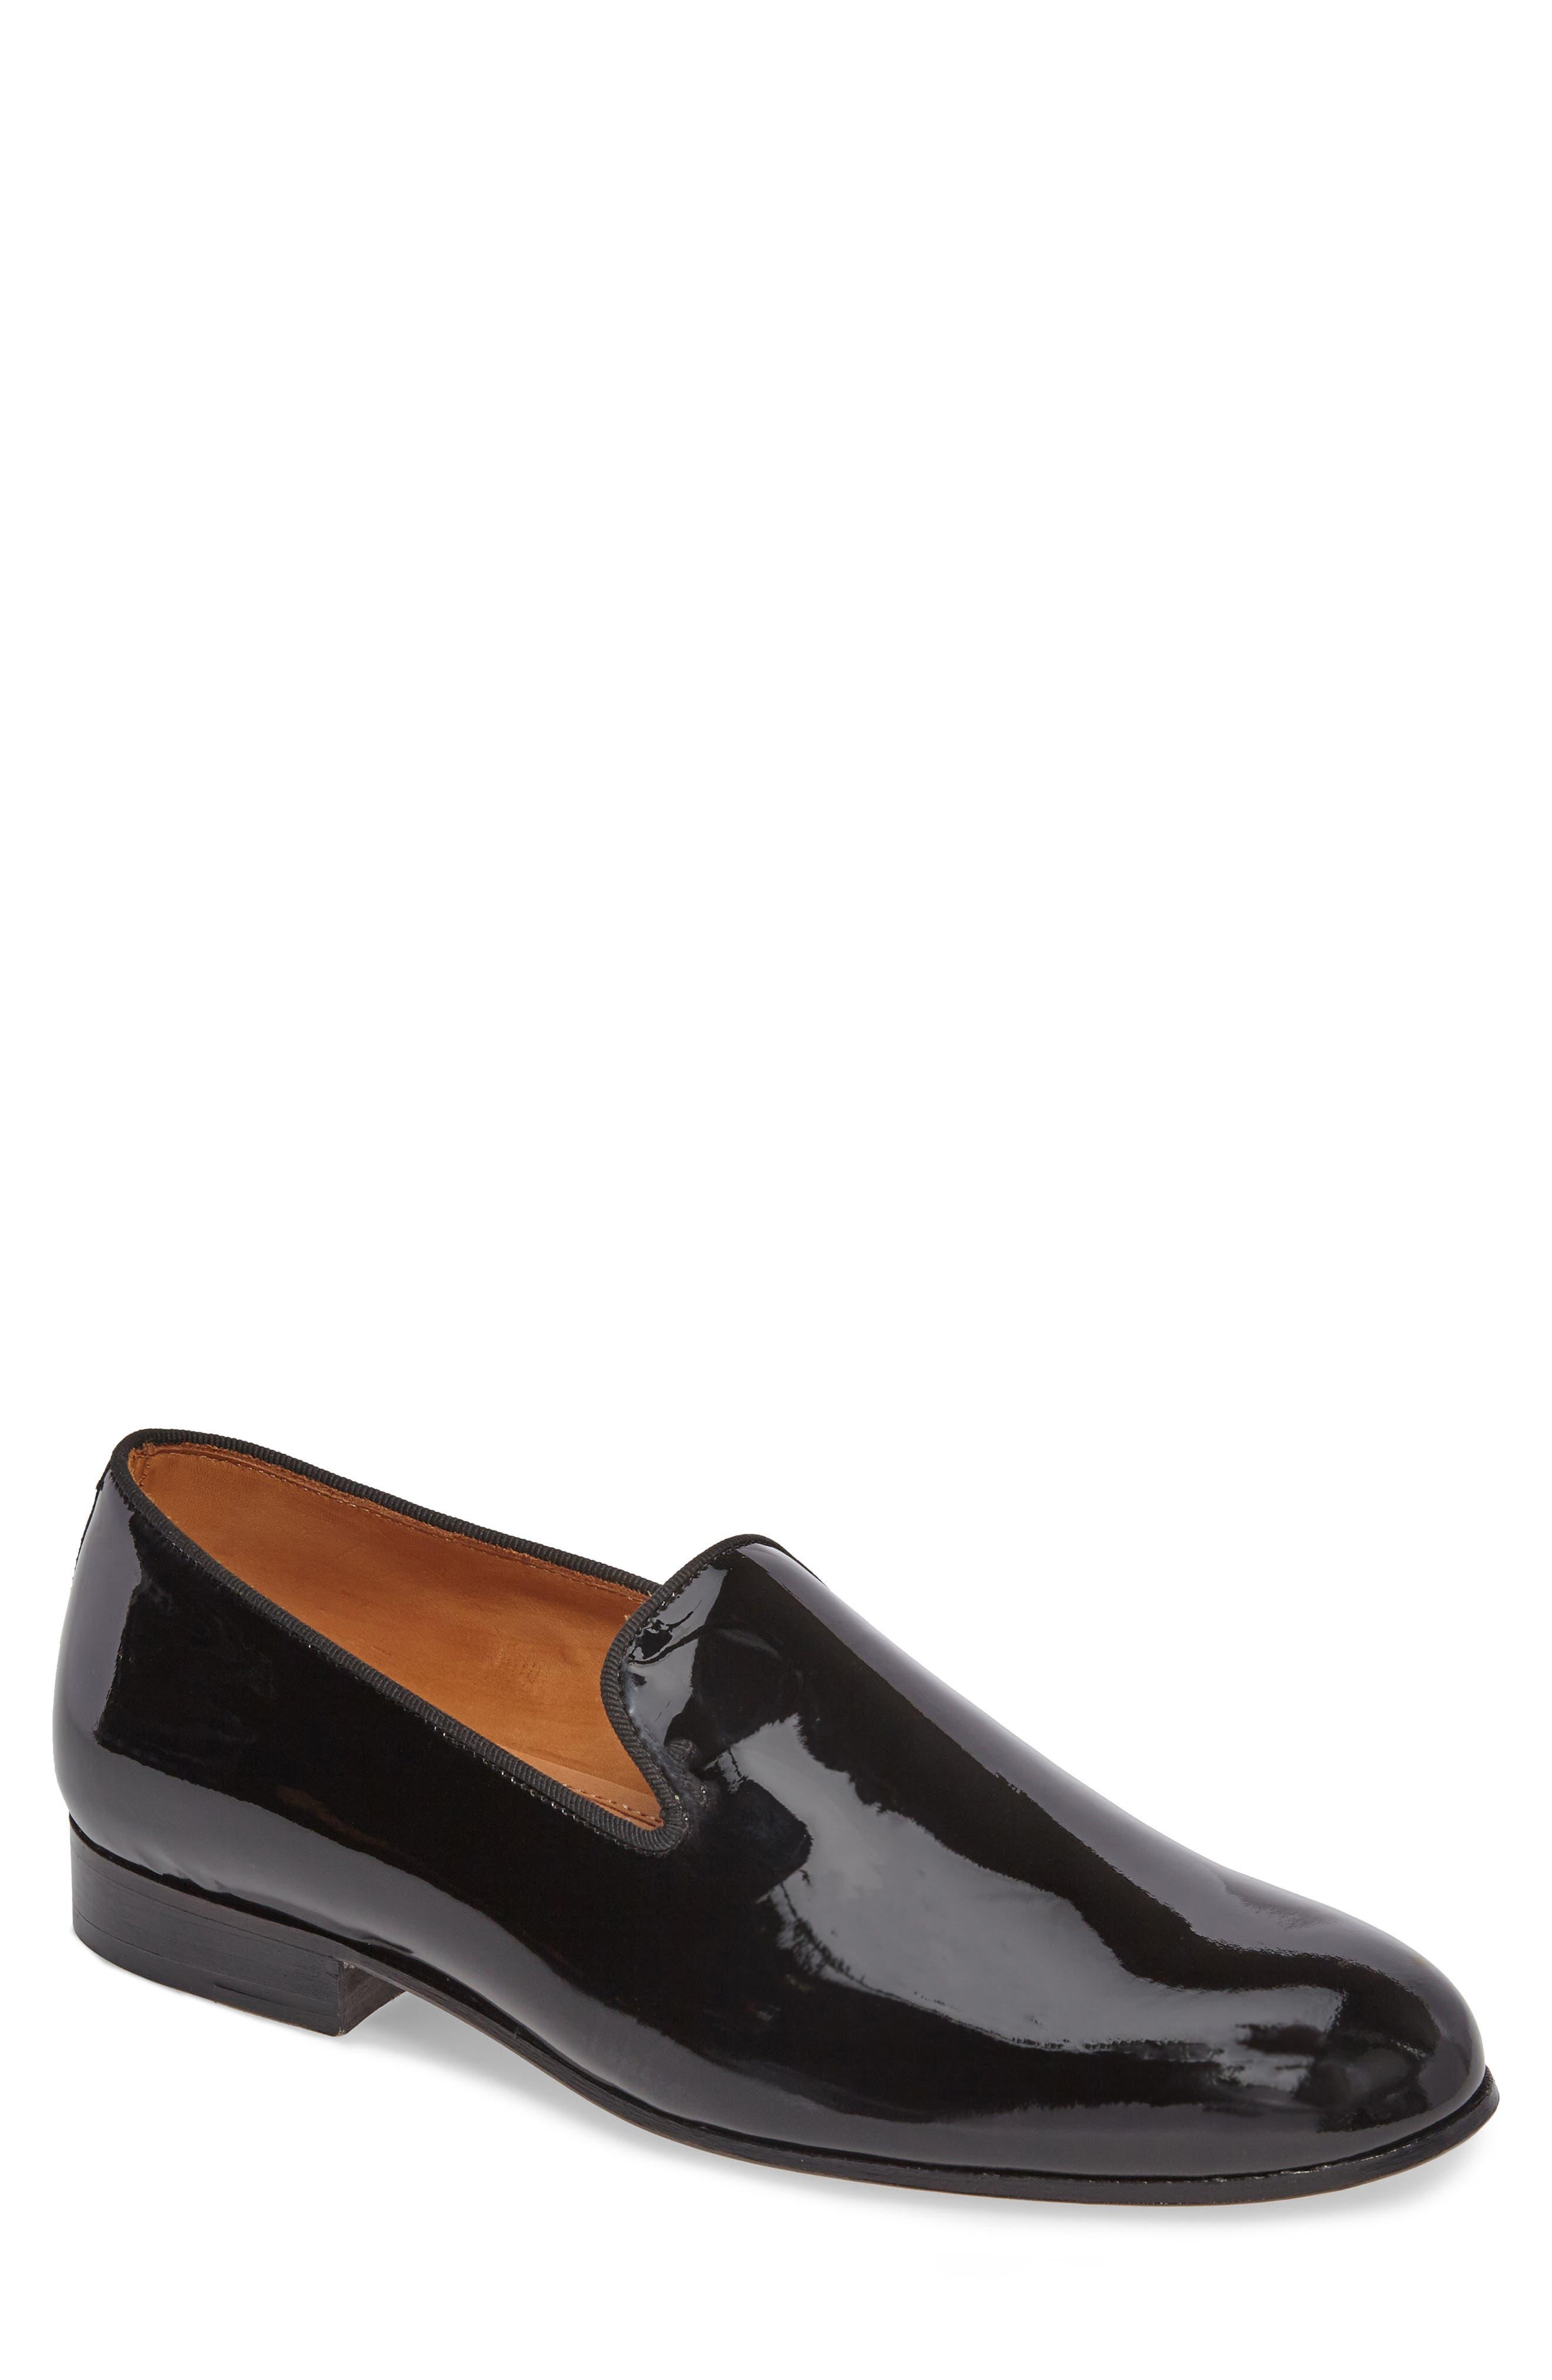 Bravi Loafer,                             Main thumbnail 1, color,                             Black Patent Leather